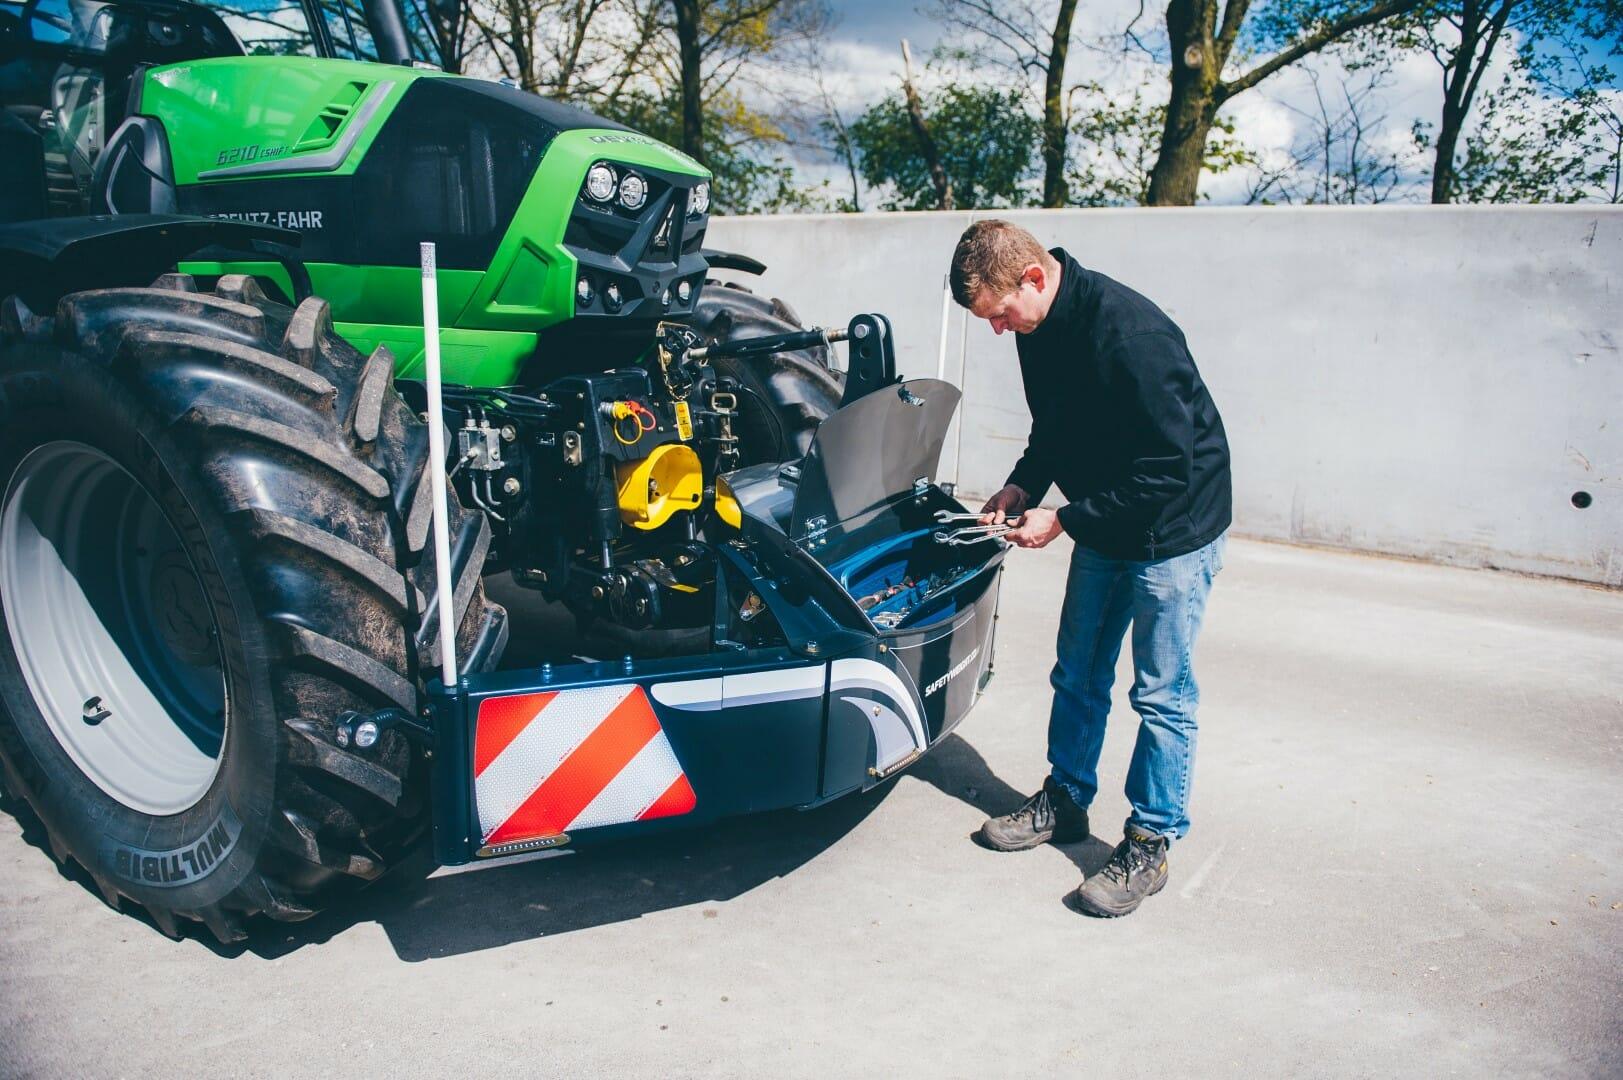 traktor-bumper-traktor-unterfahrschutz